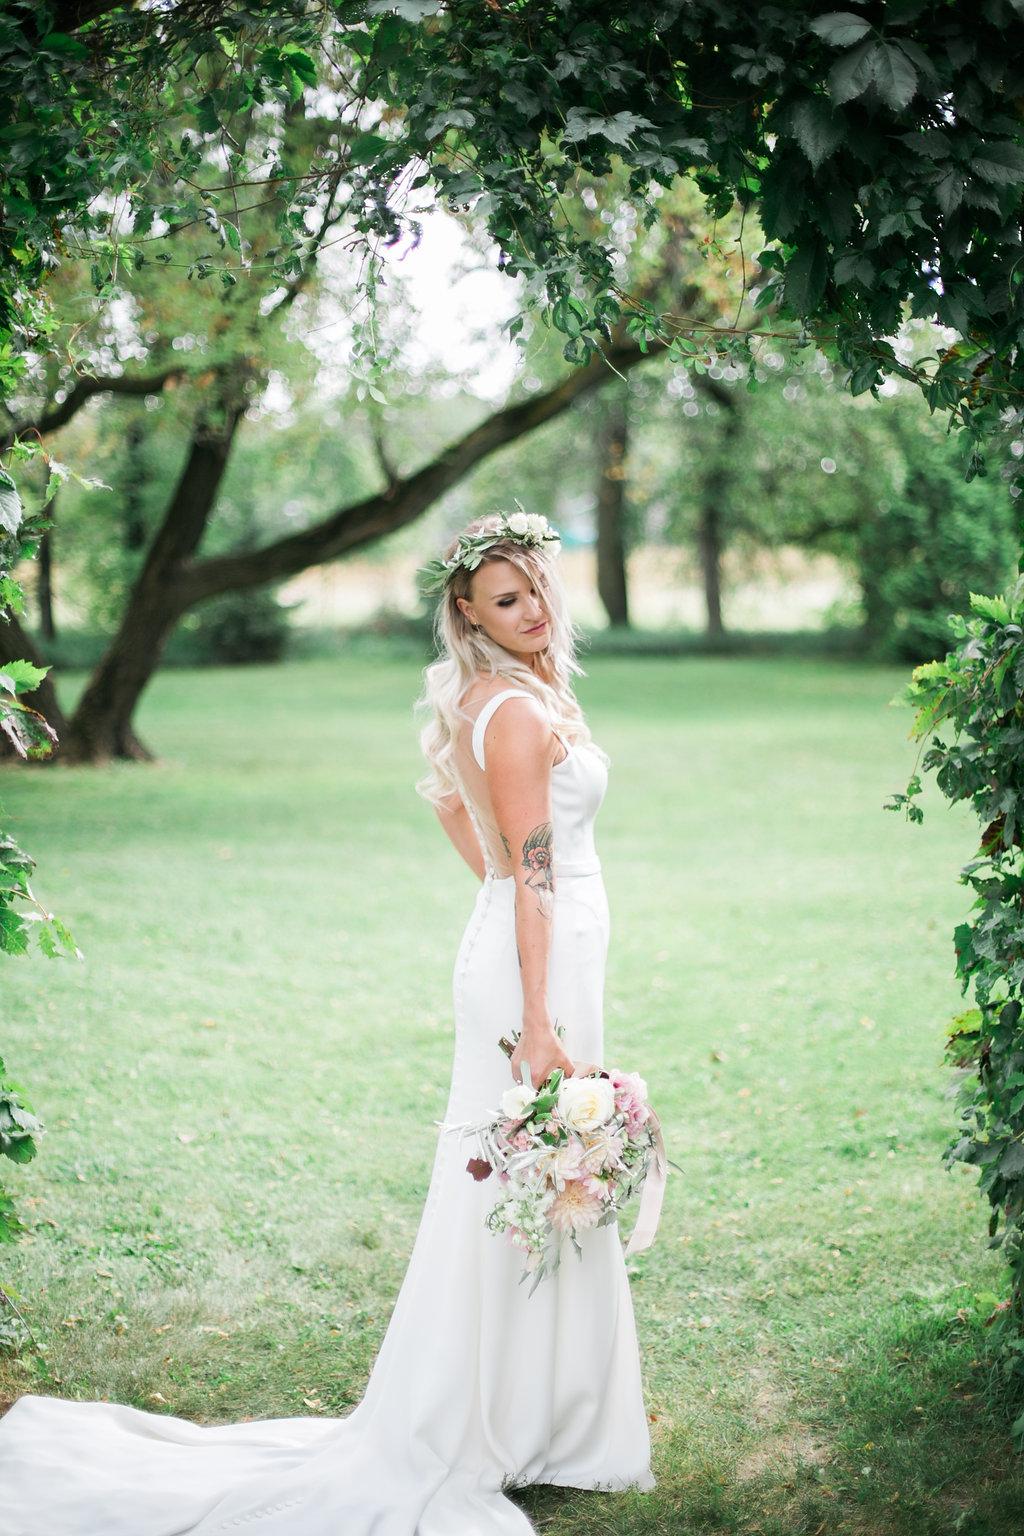 Blush Bridal Bouquet - Stone House Creative